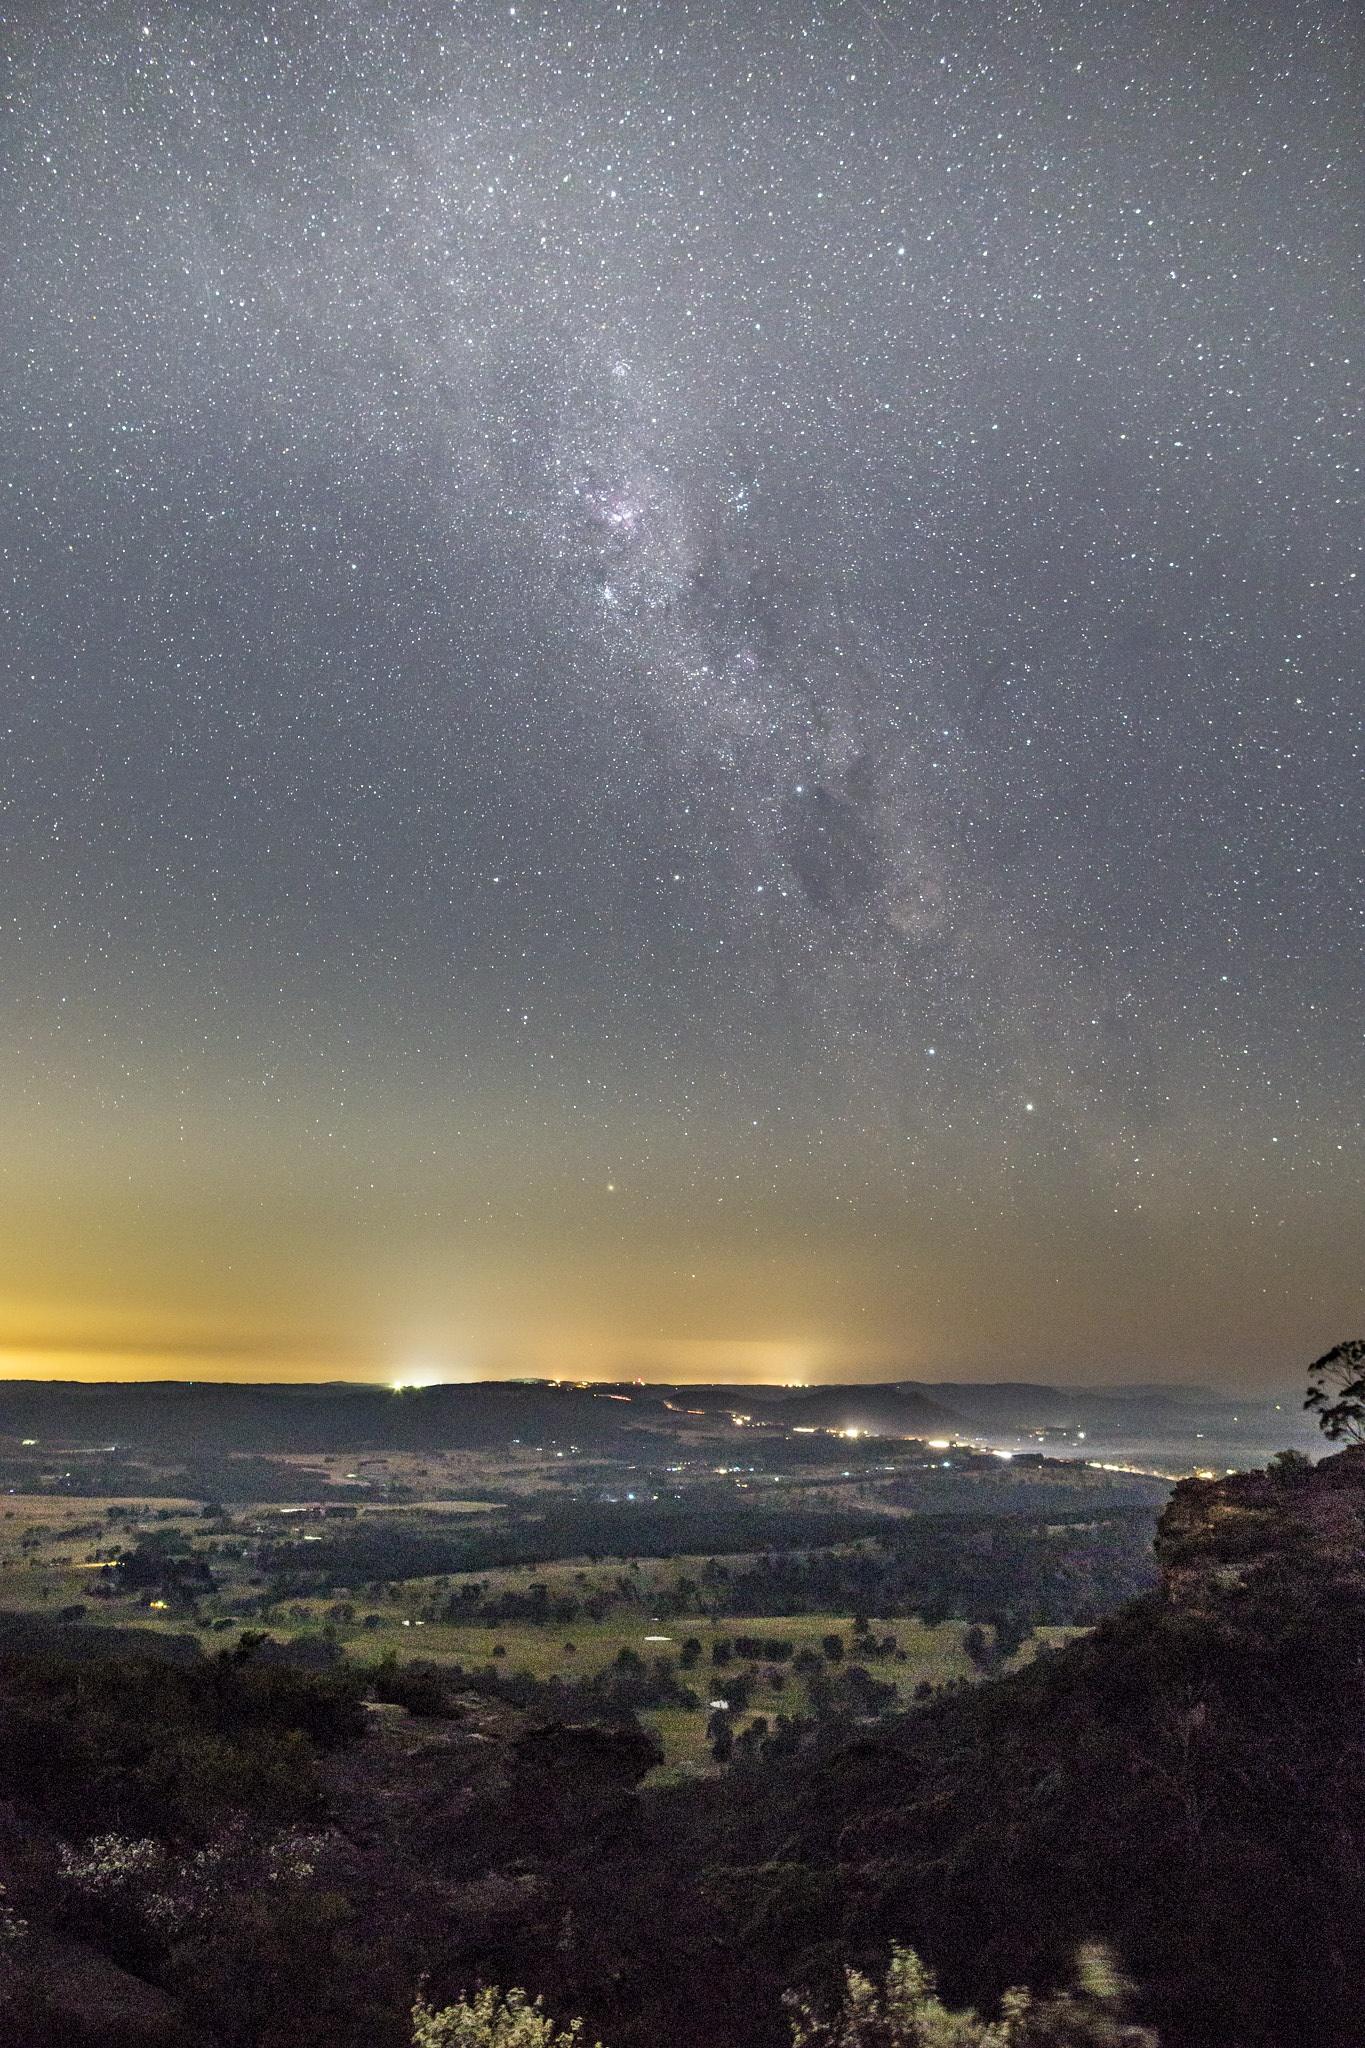 Starry Starry Night 1 by Doc Jones